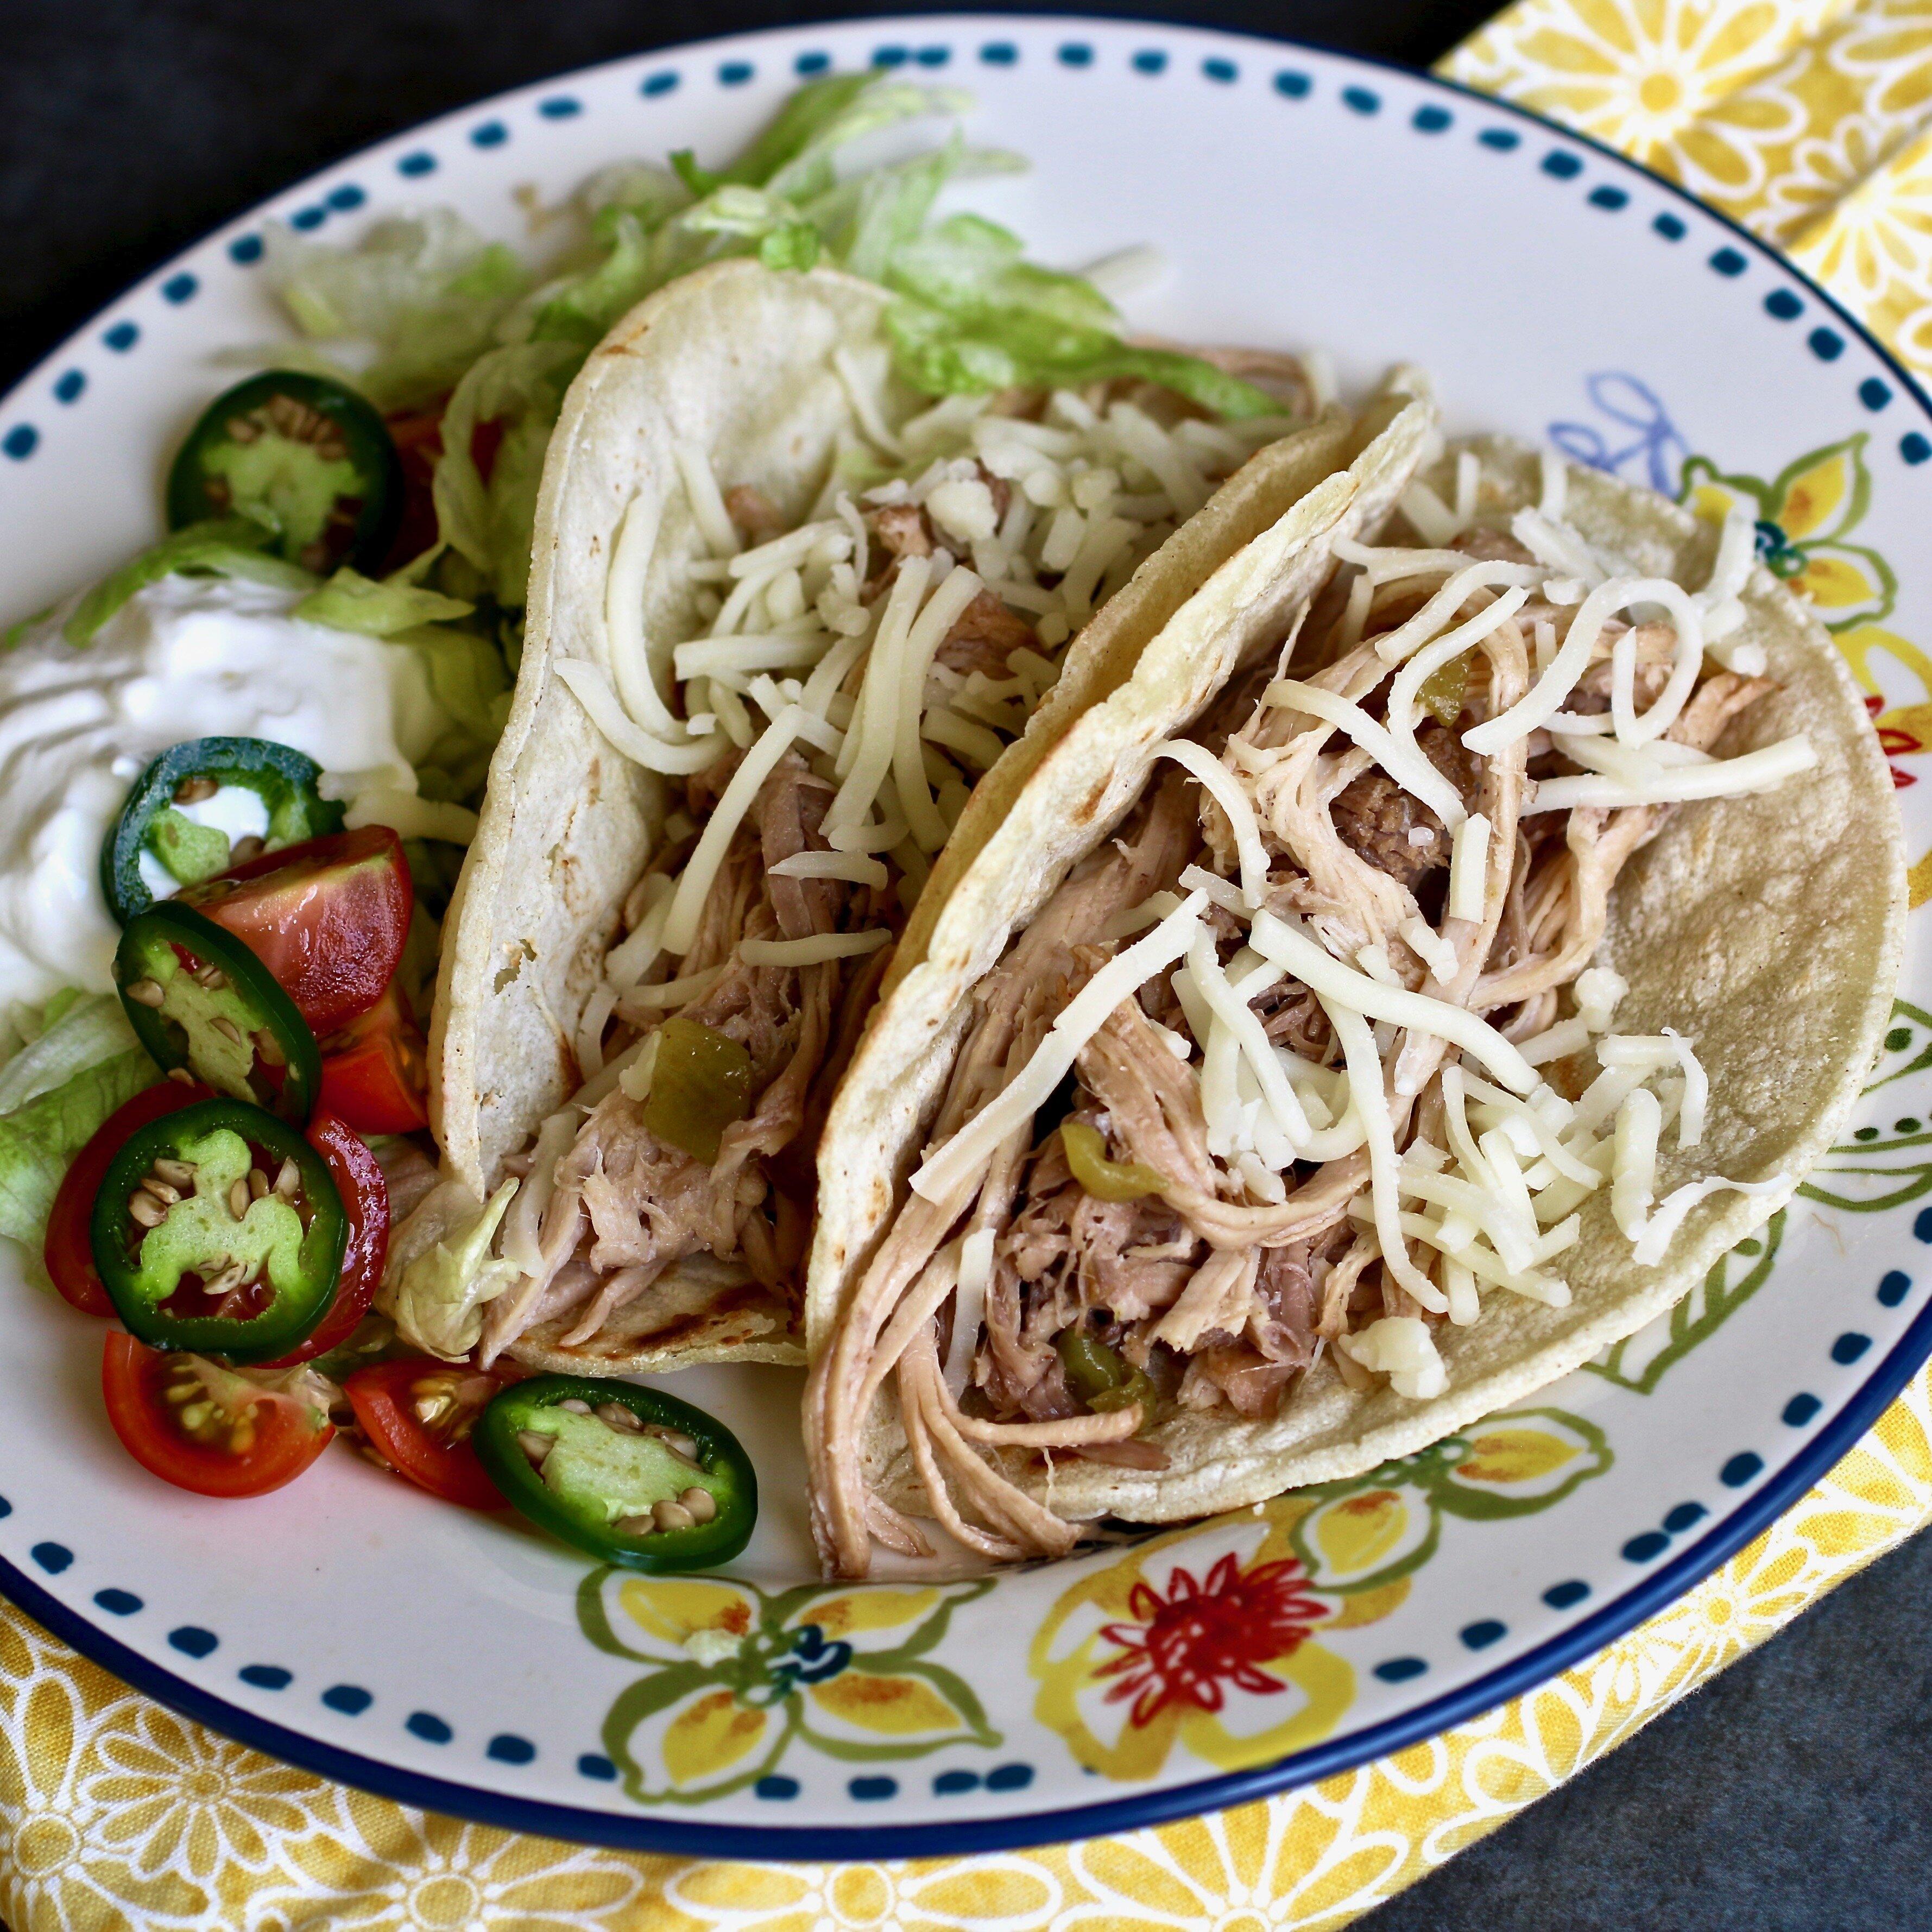 slow cooker pulled pork for tacos